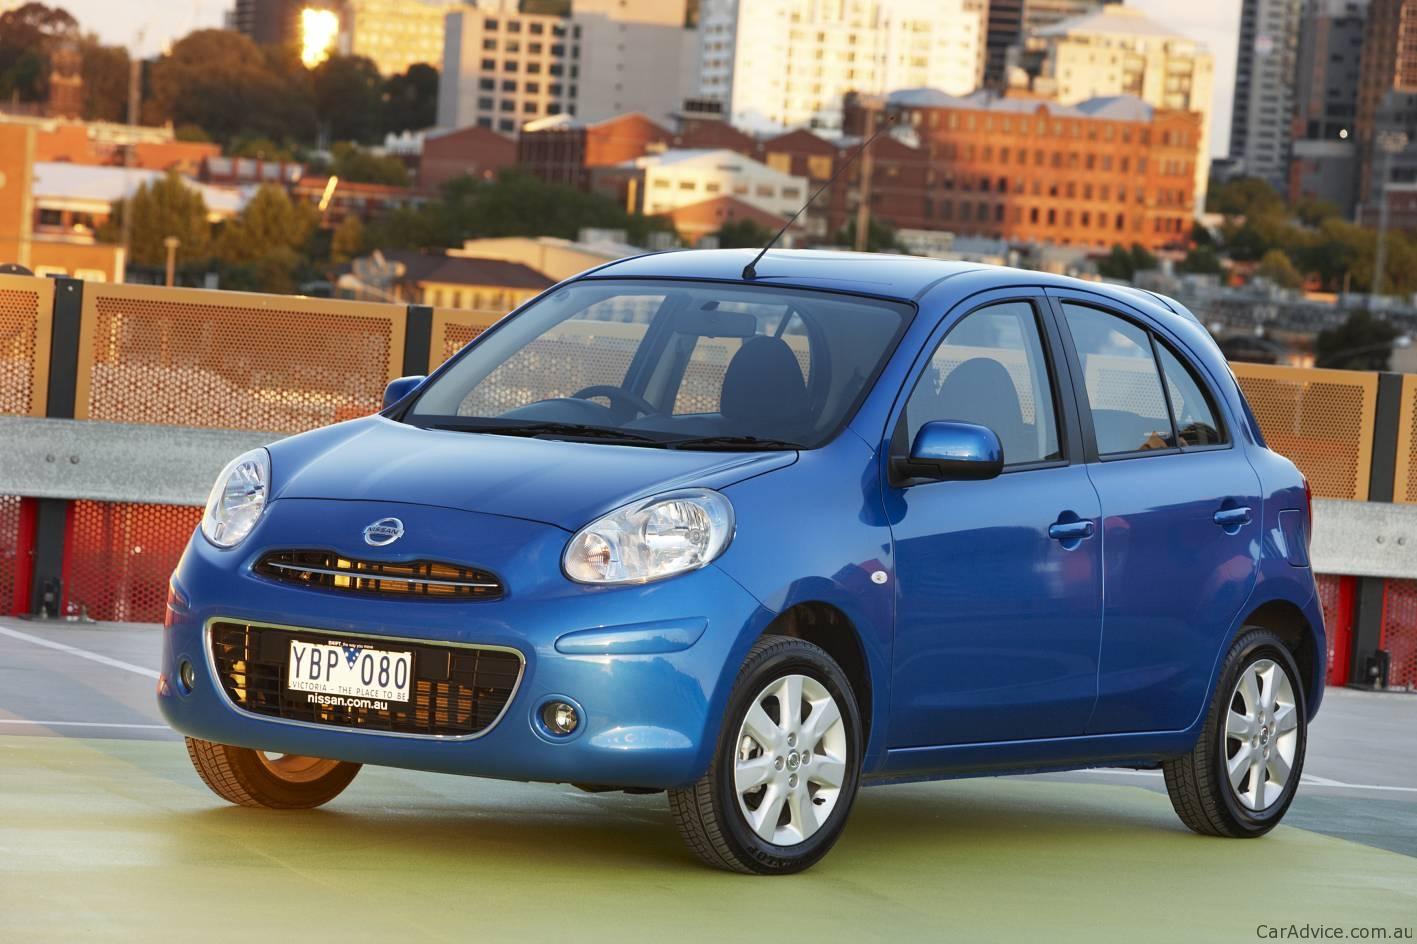 Nissan Micra Blue on 2006 Hyundai Tucson Blue